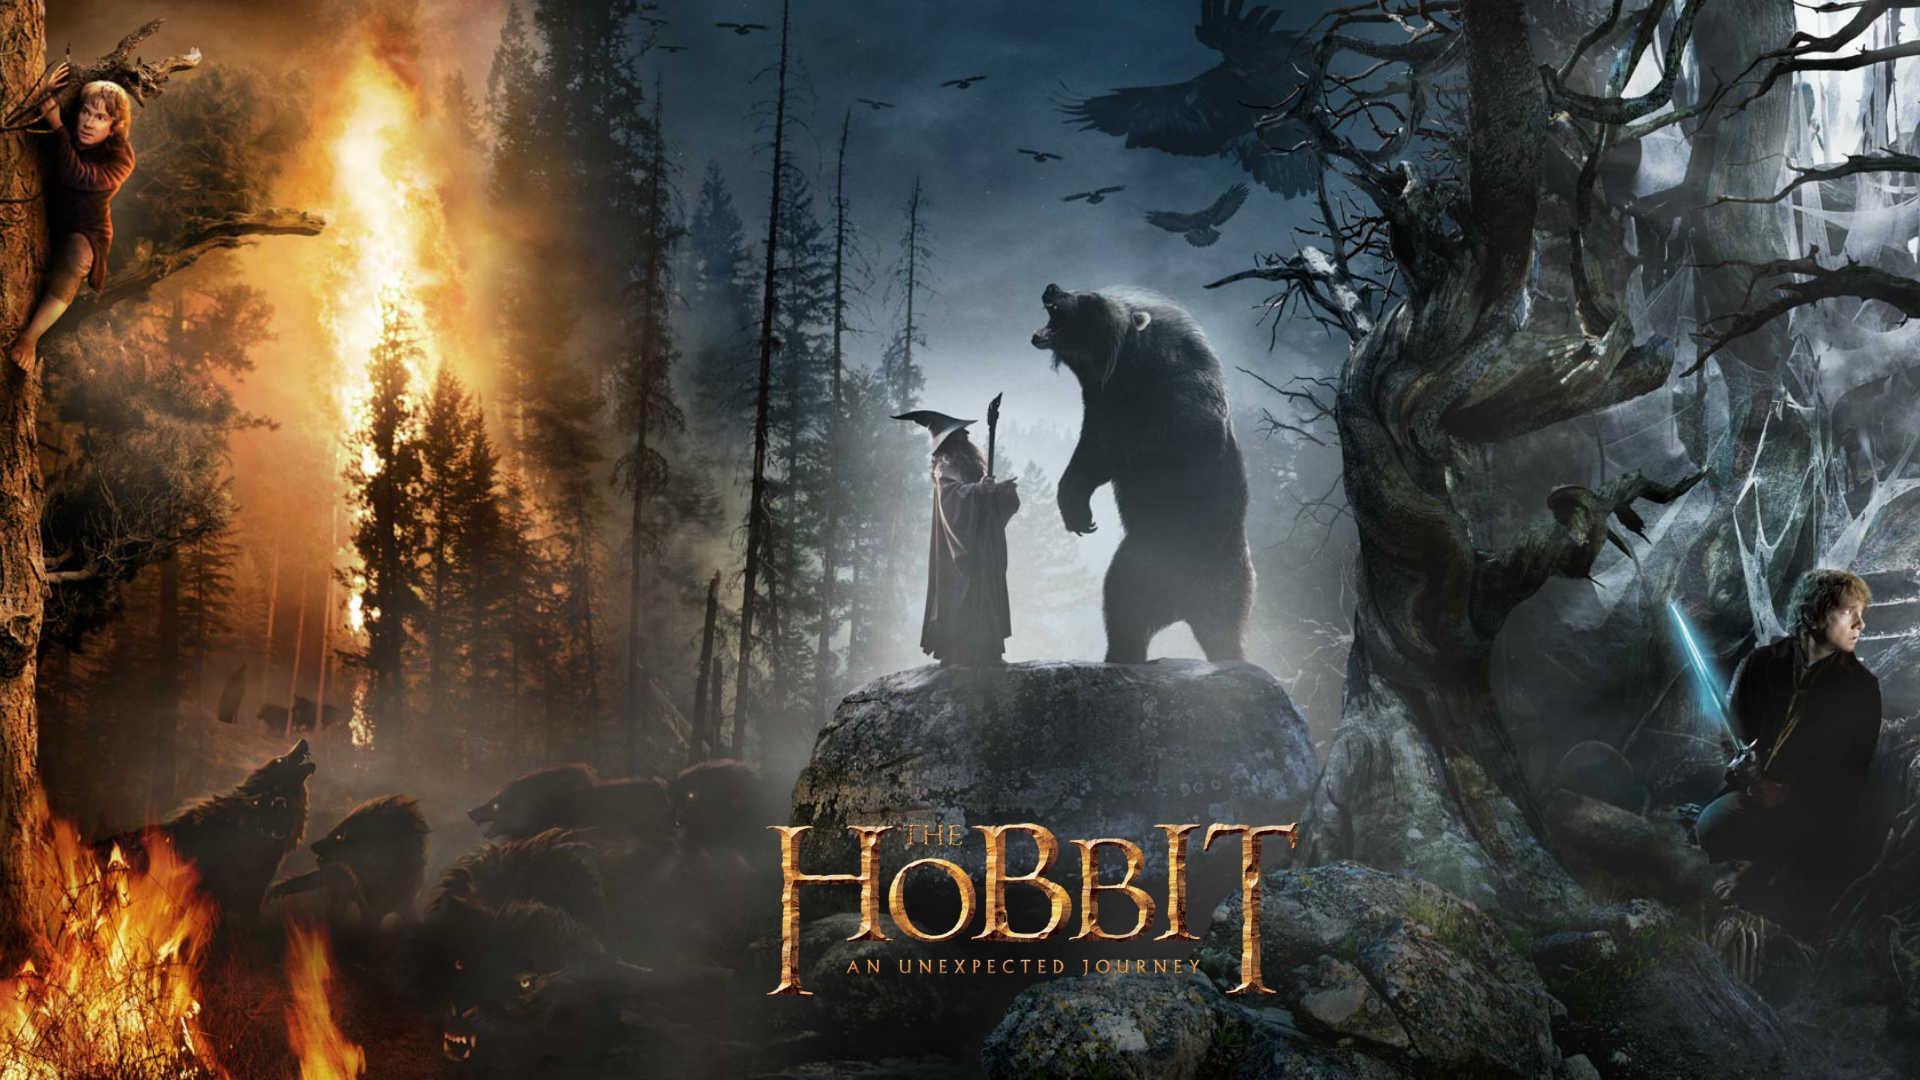 the hobbit 2012 movie HDjpg 1920x1080